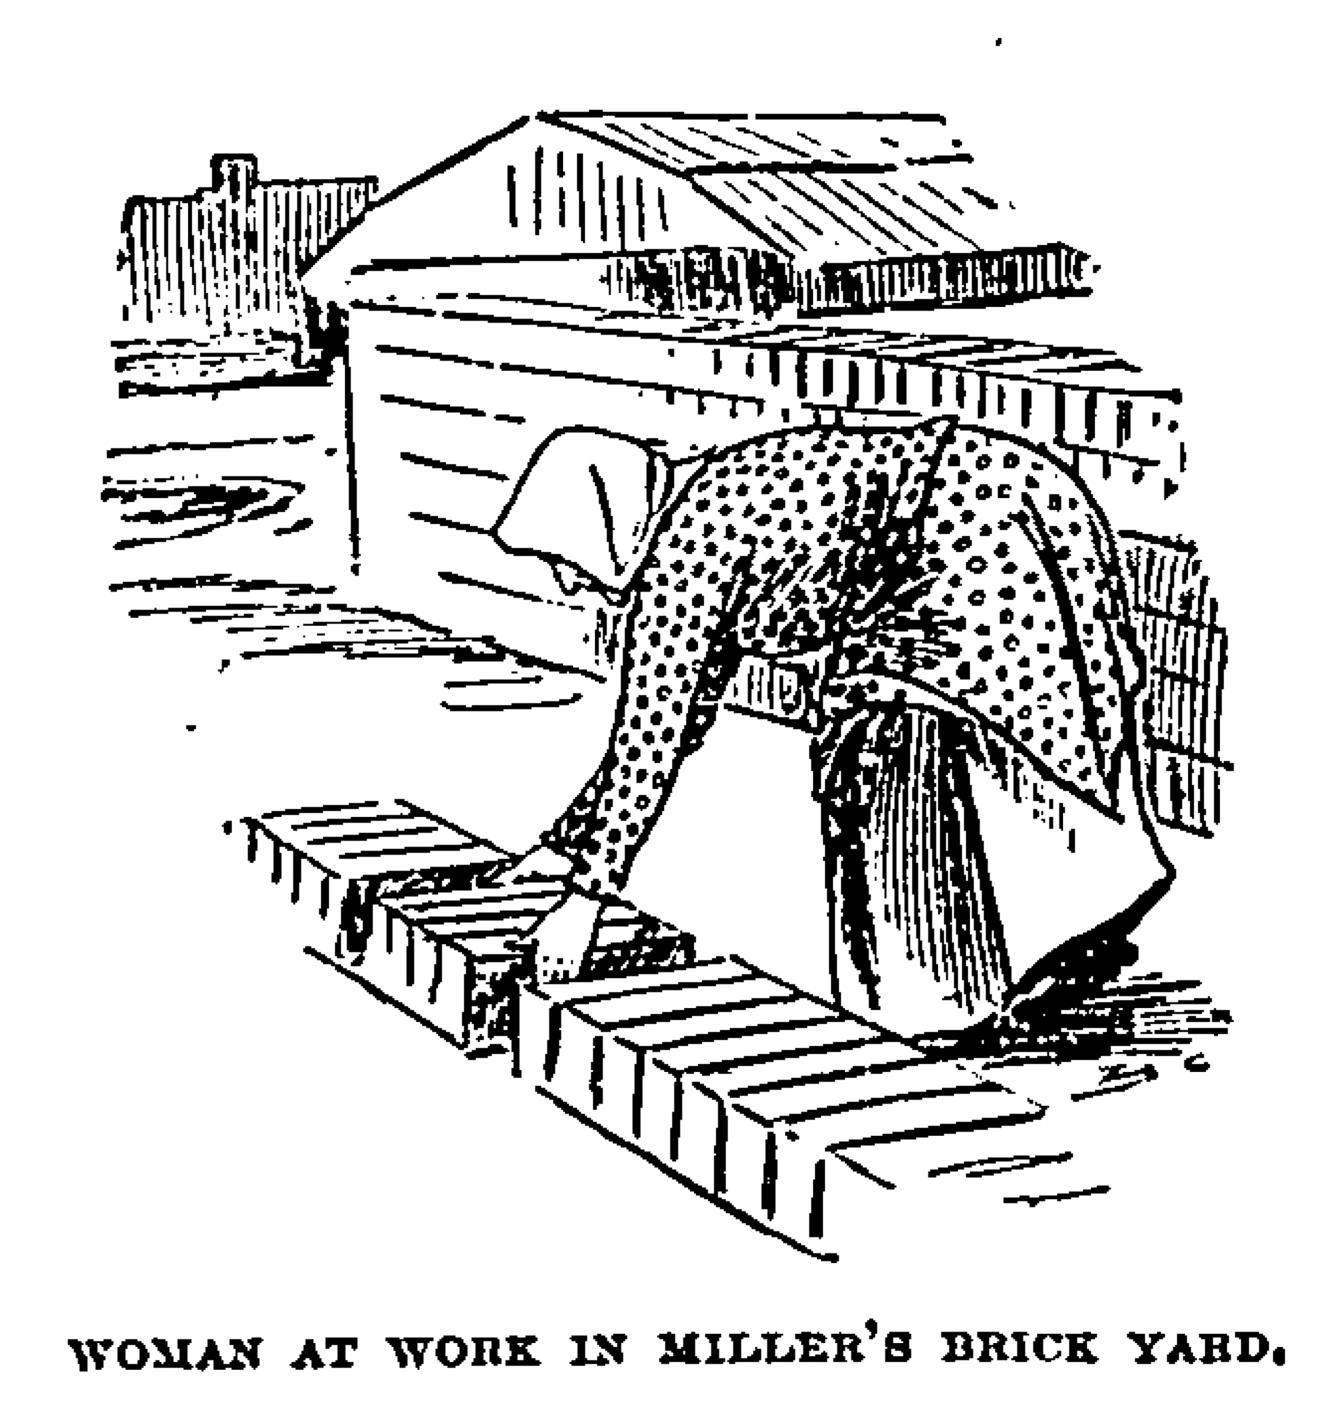 Woman bending down to turn bricks